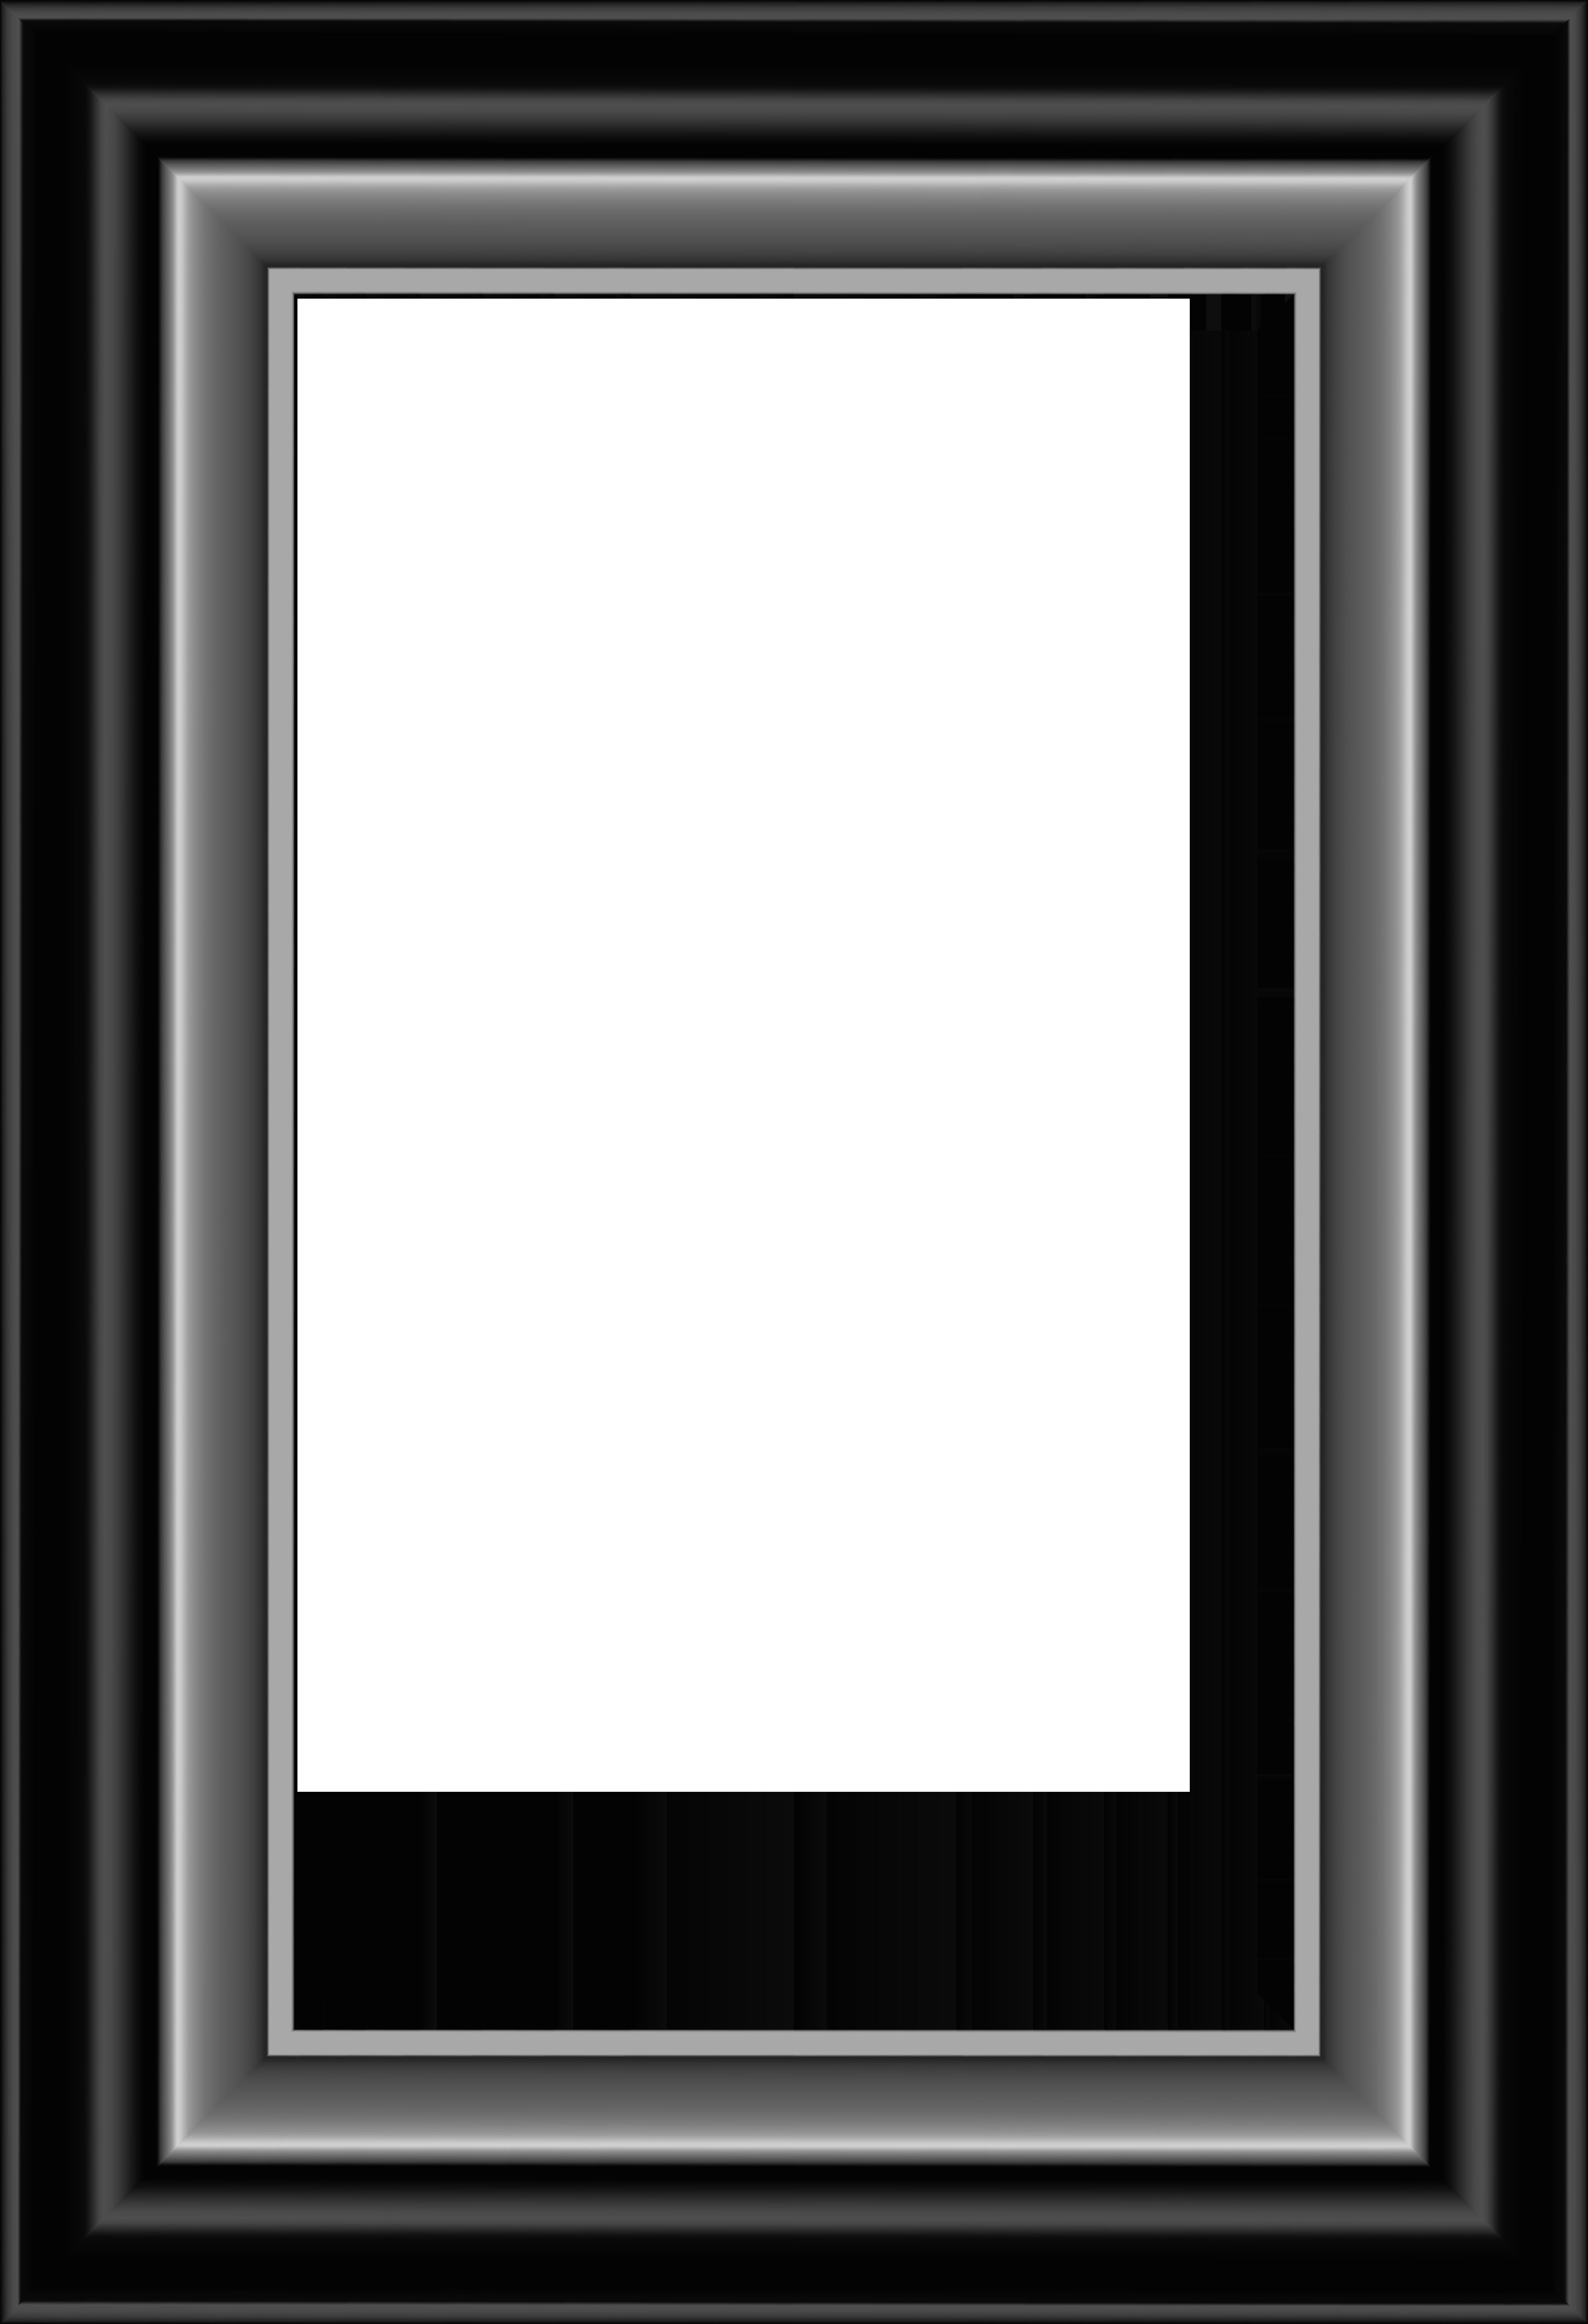 Black and Silver Frame Transparent PNG Image.